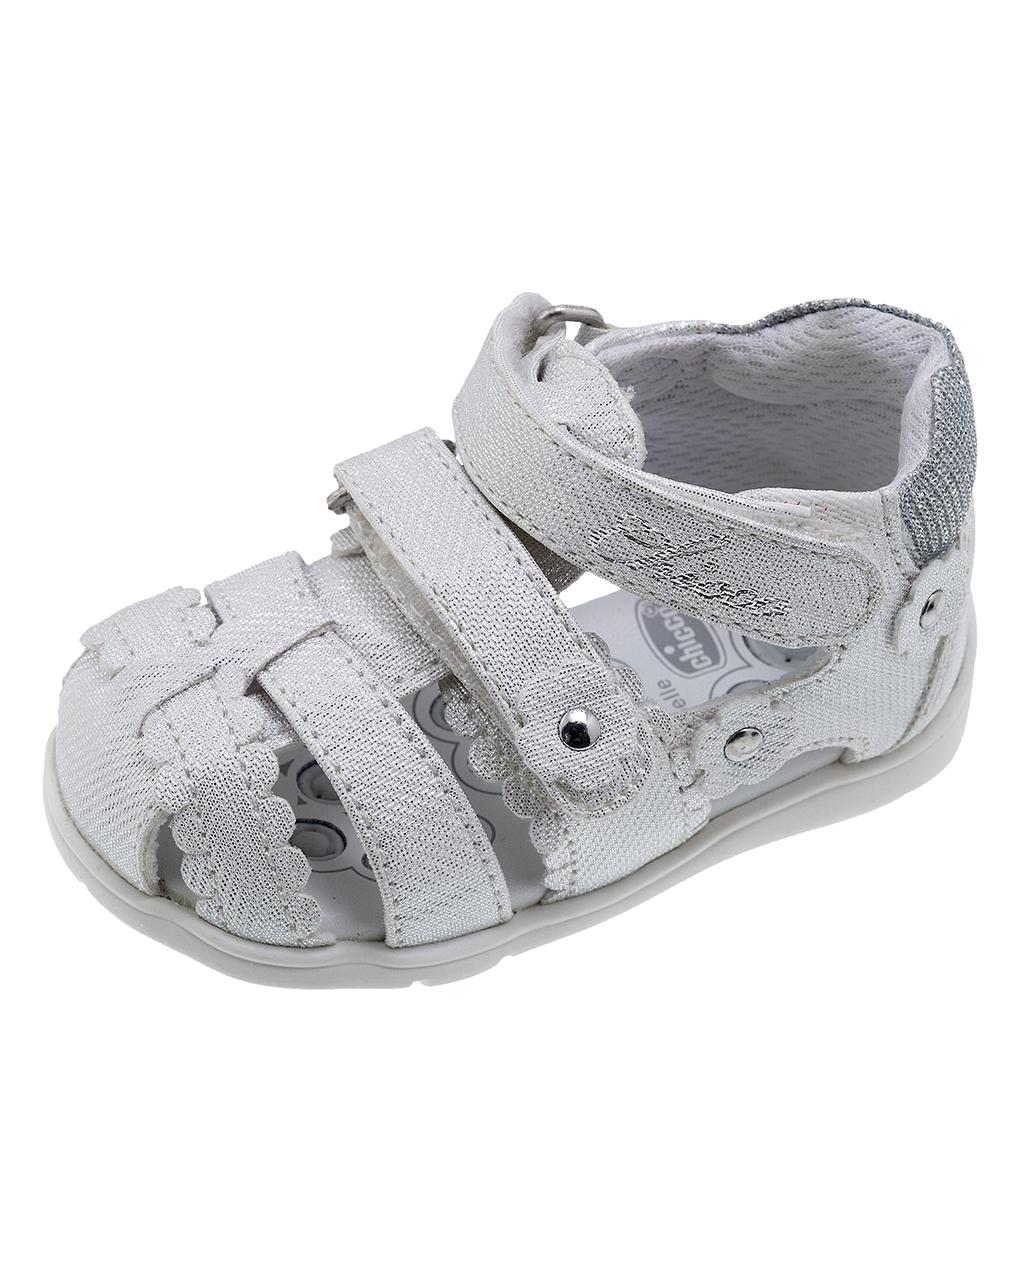 Sandalo femmina gory - Chicco